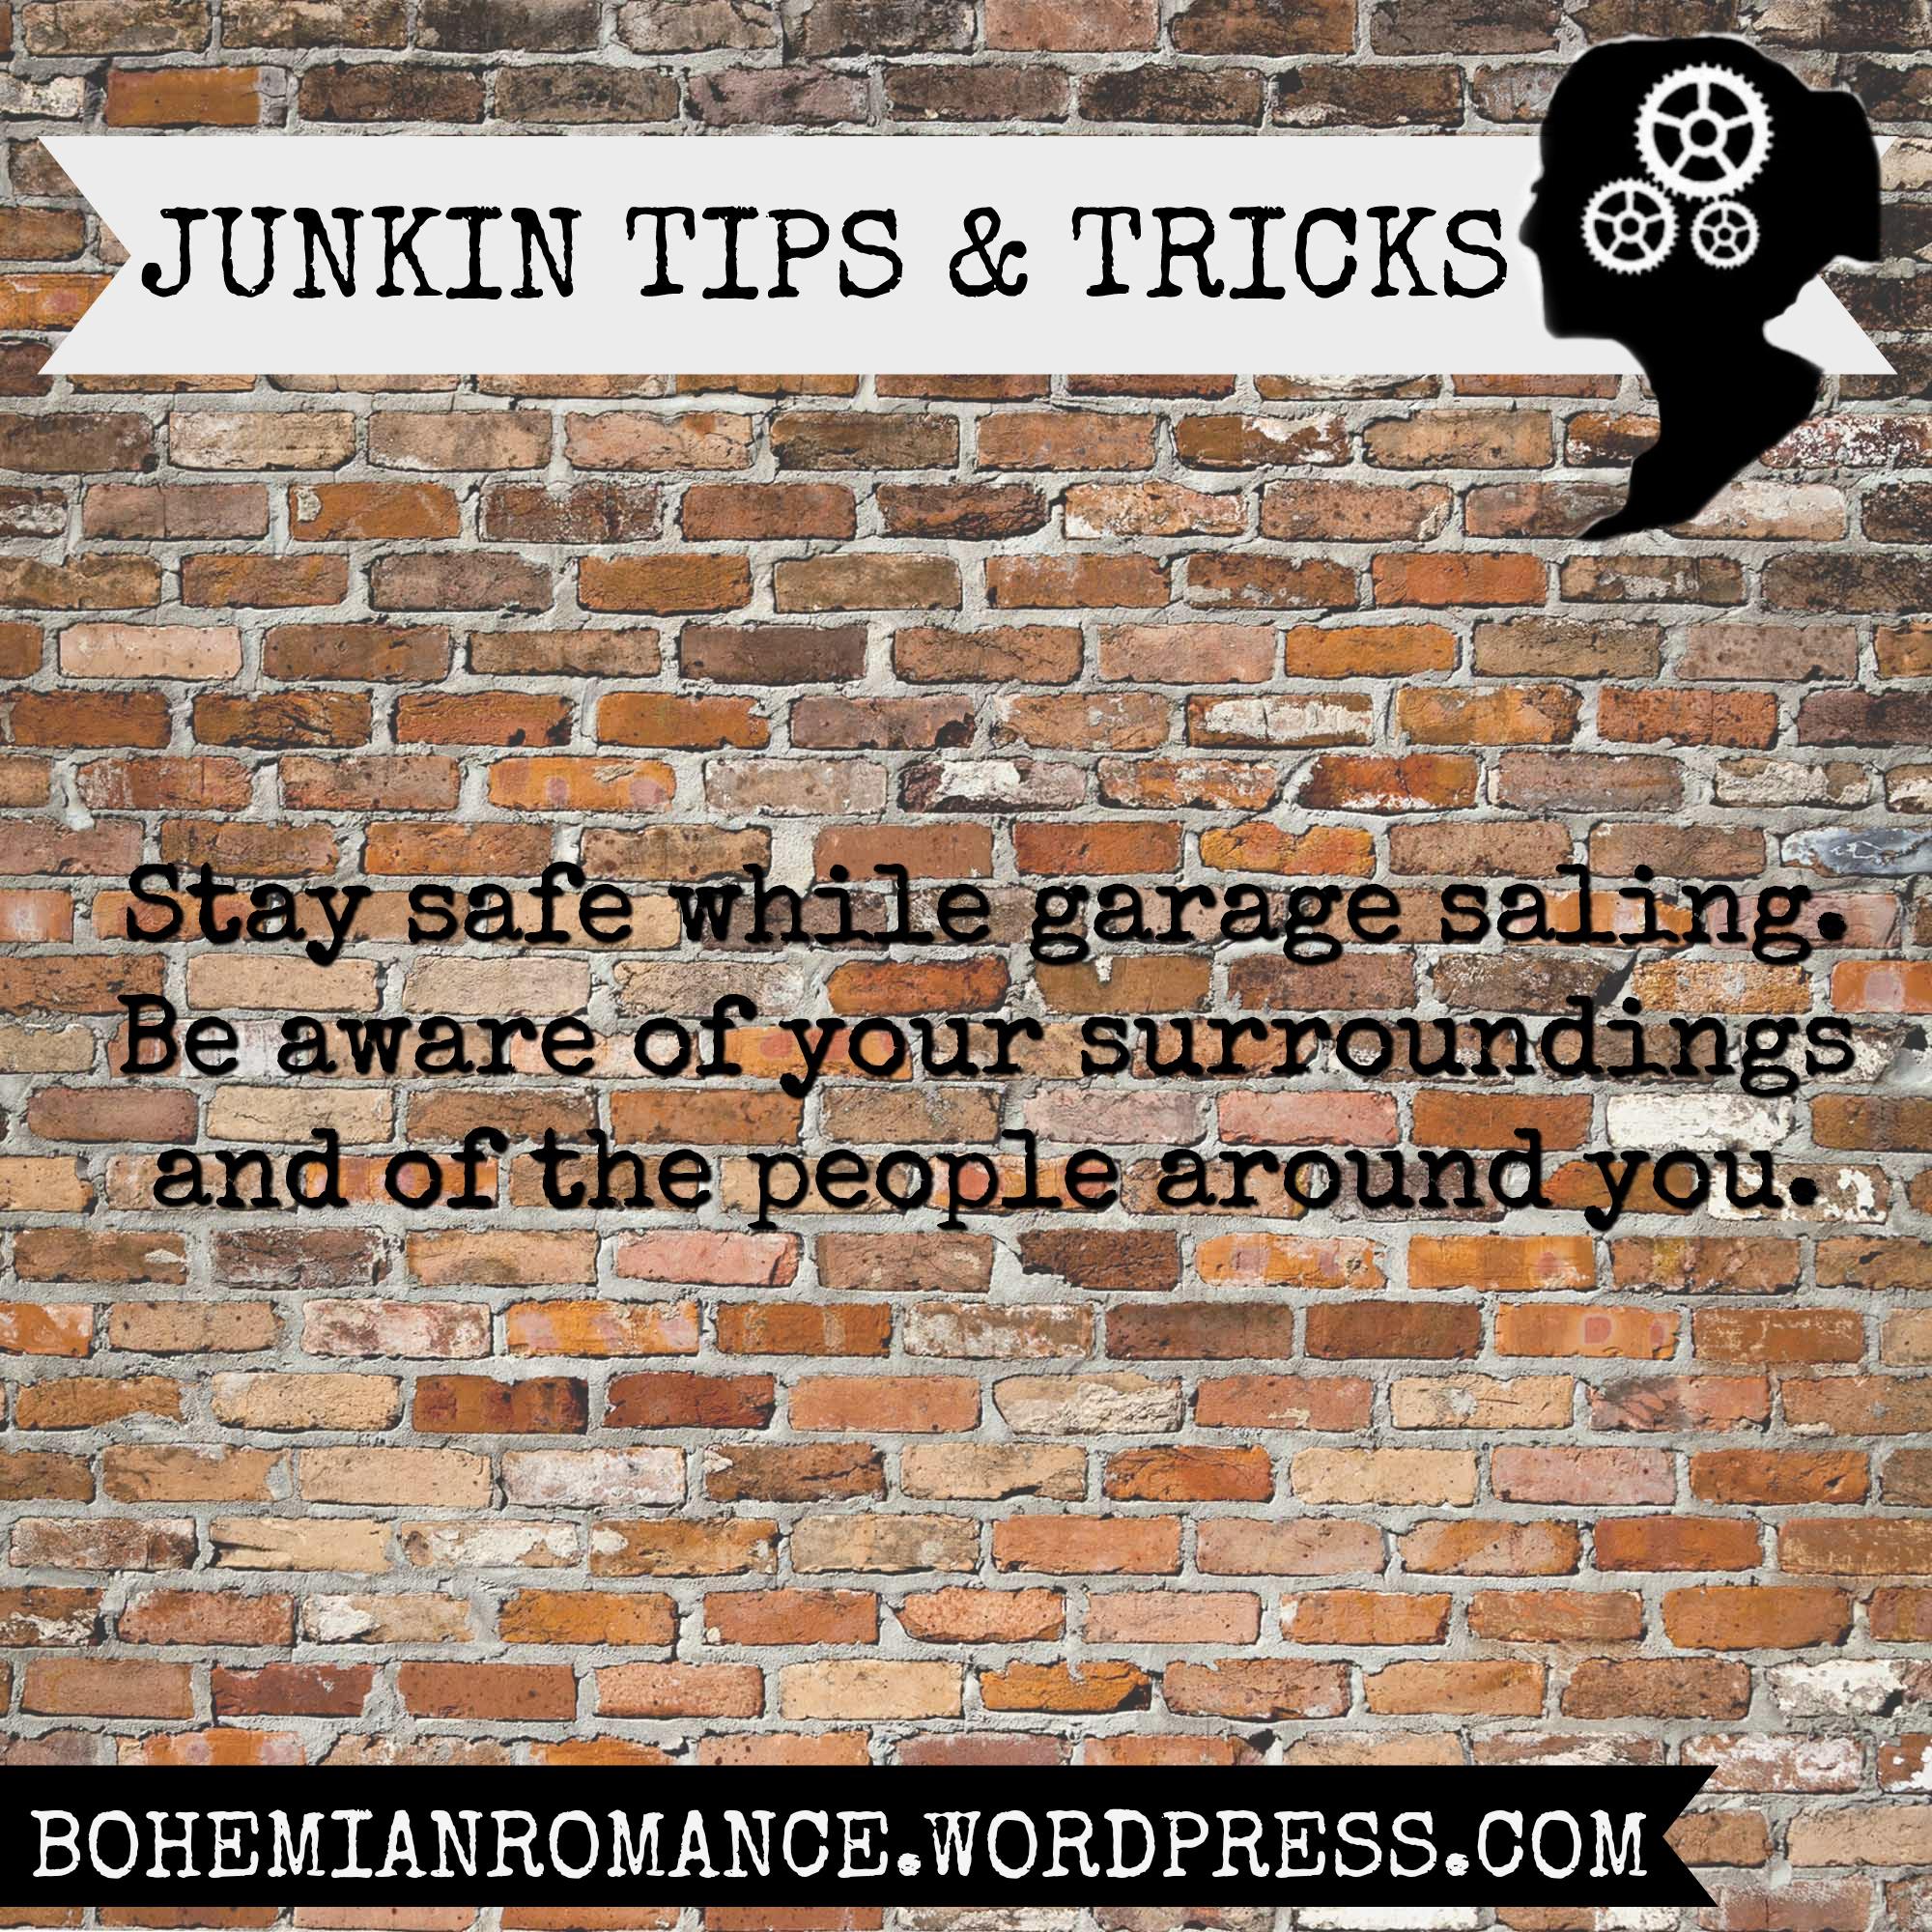 23-junkin-tips-tricks-template